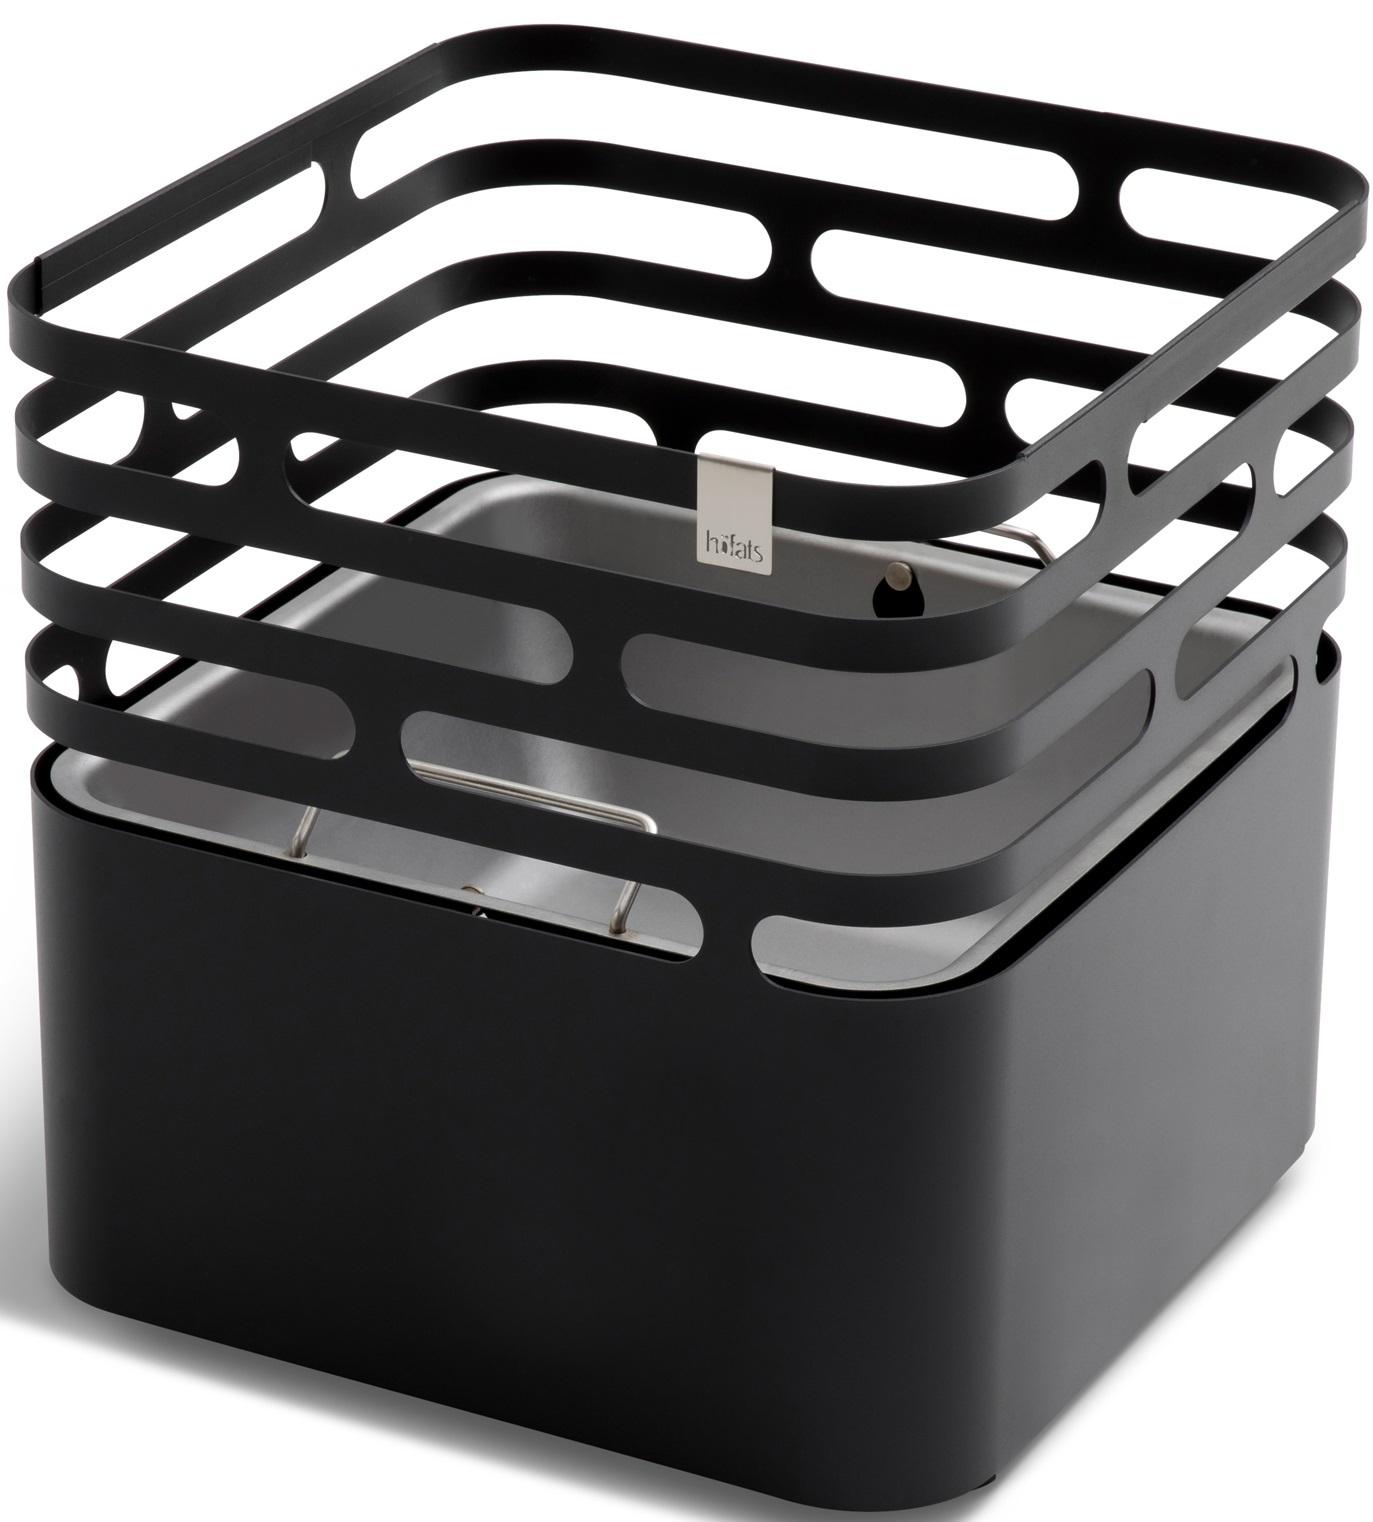 Cube fire basket black höfats